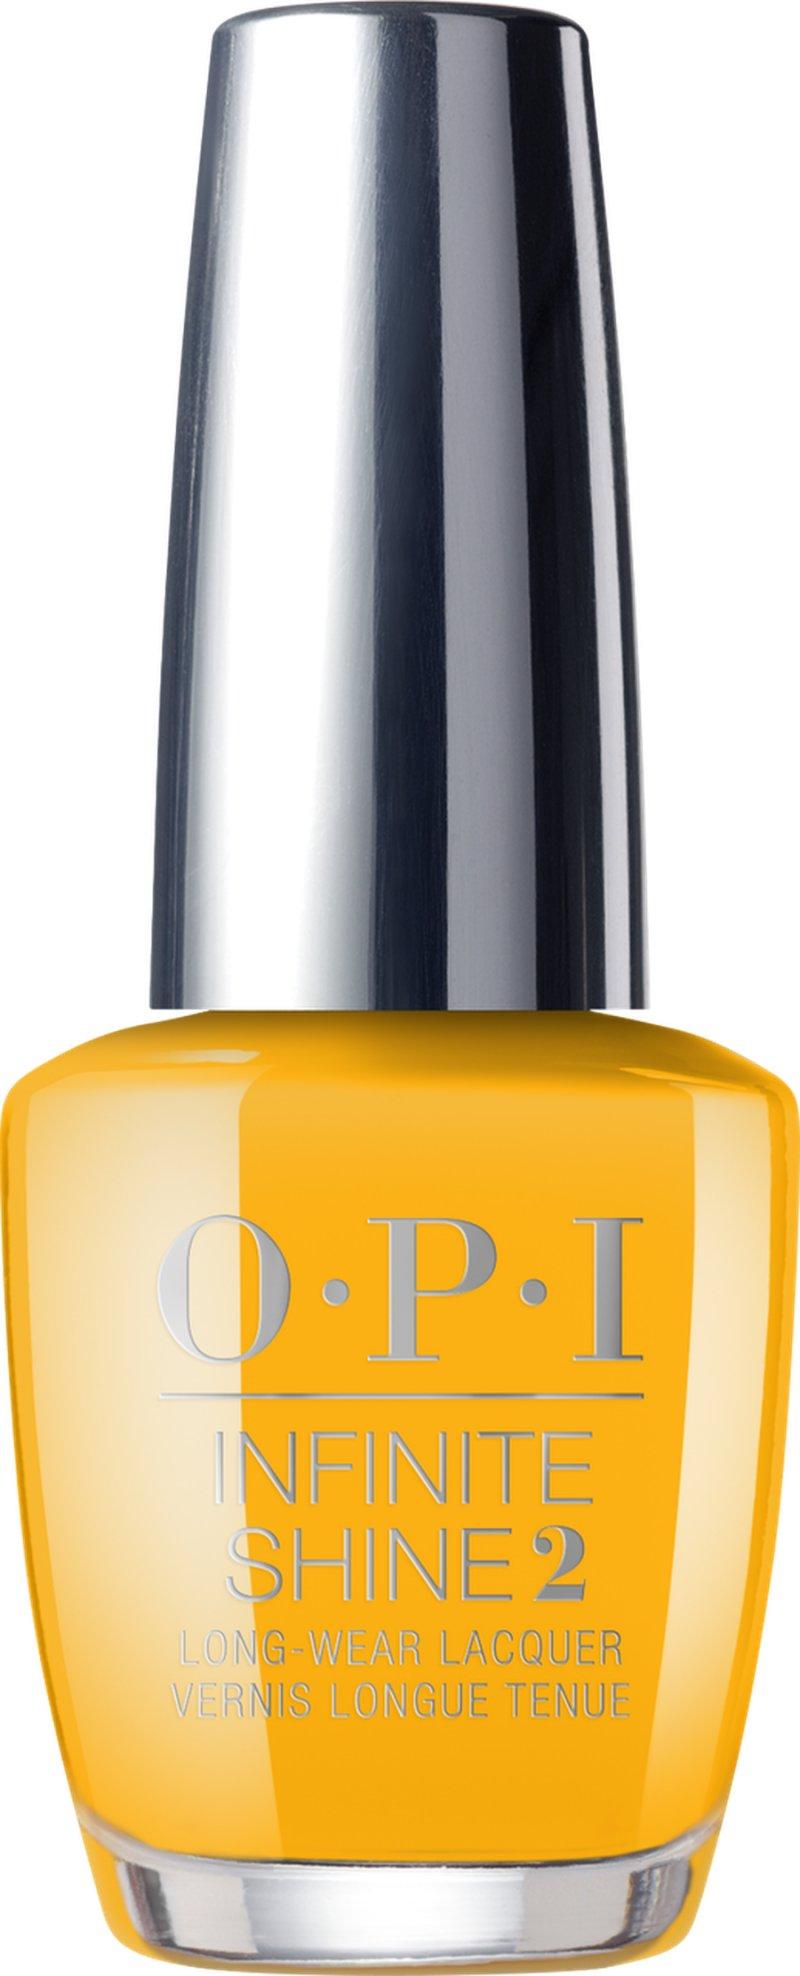 Opi - Nail Polish 15 Ml - Sun, Sea And Sand In My Pants